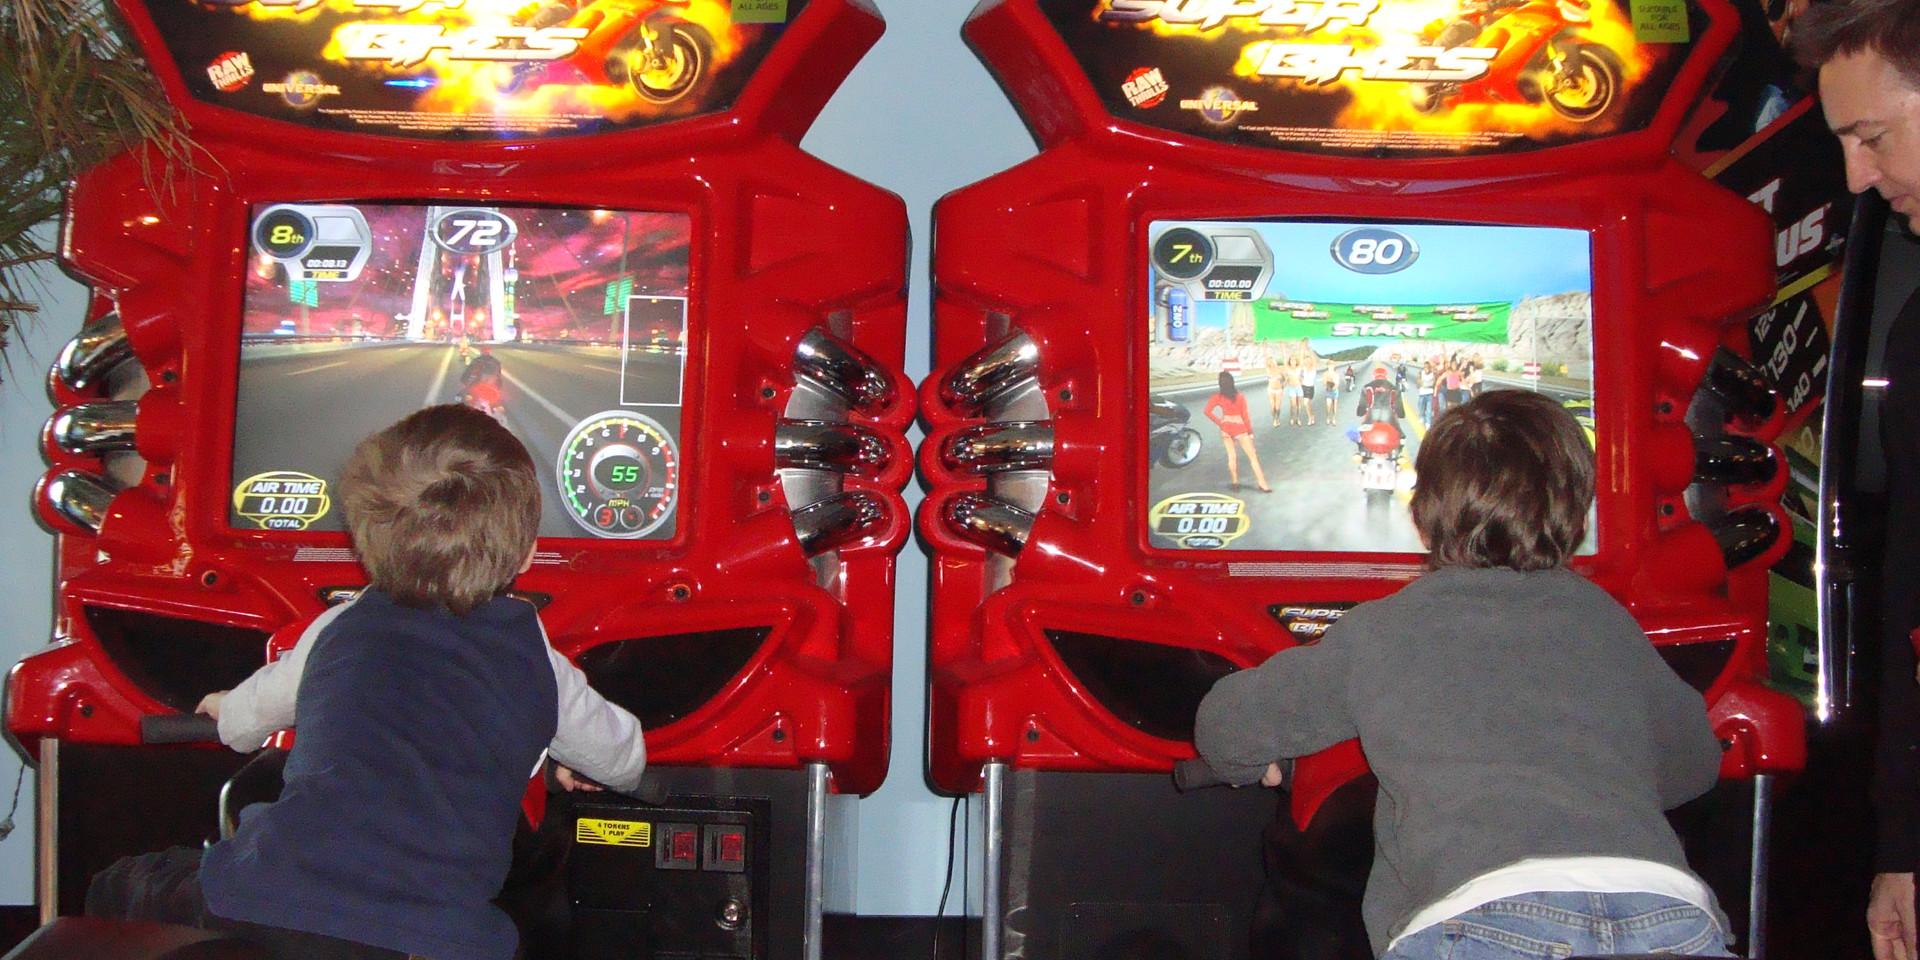 kids playing car racing during field trip